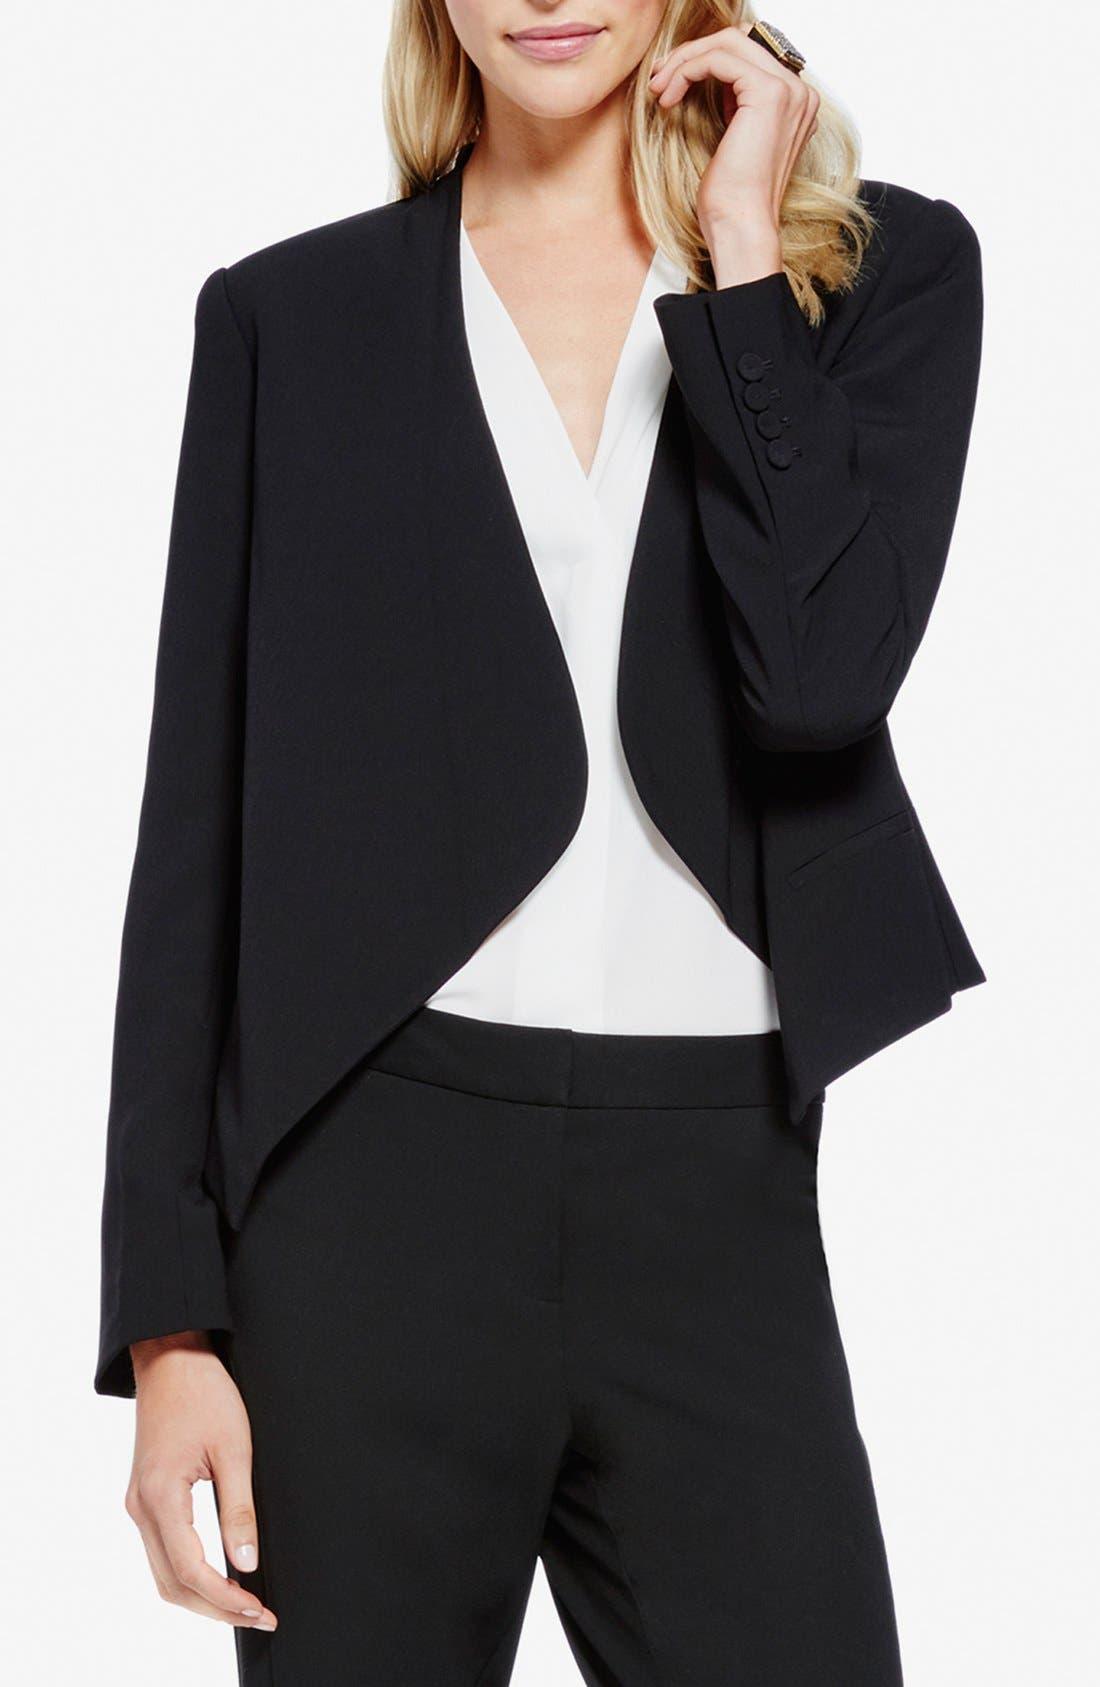 Alternate Image 1 Selected - Vince Camuto Drape Front Blazer (Petite)